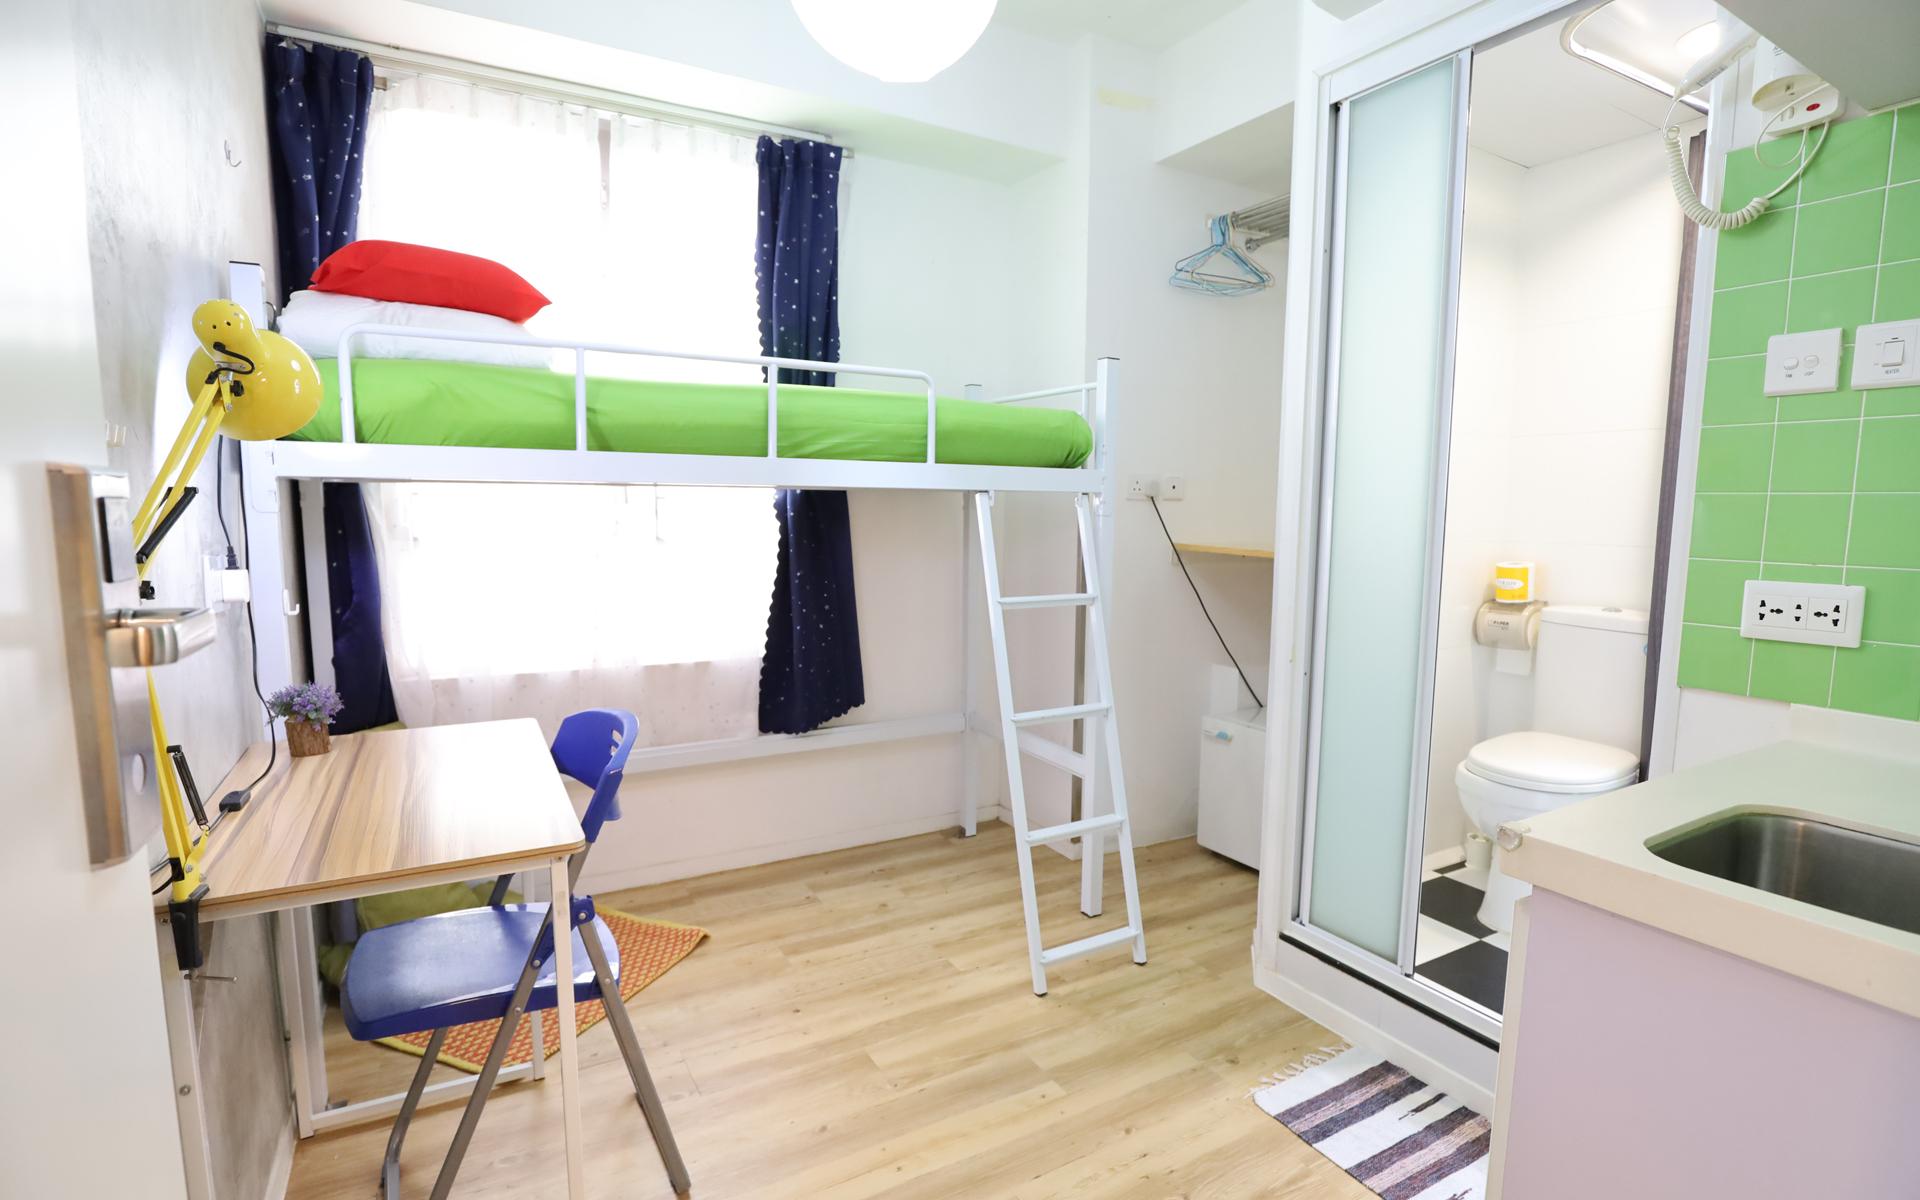 hk_service_apartment_6625024501580704622.jpg